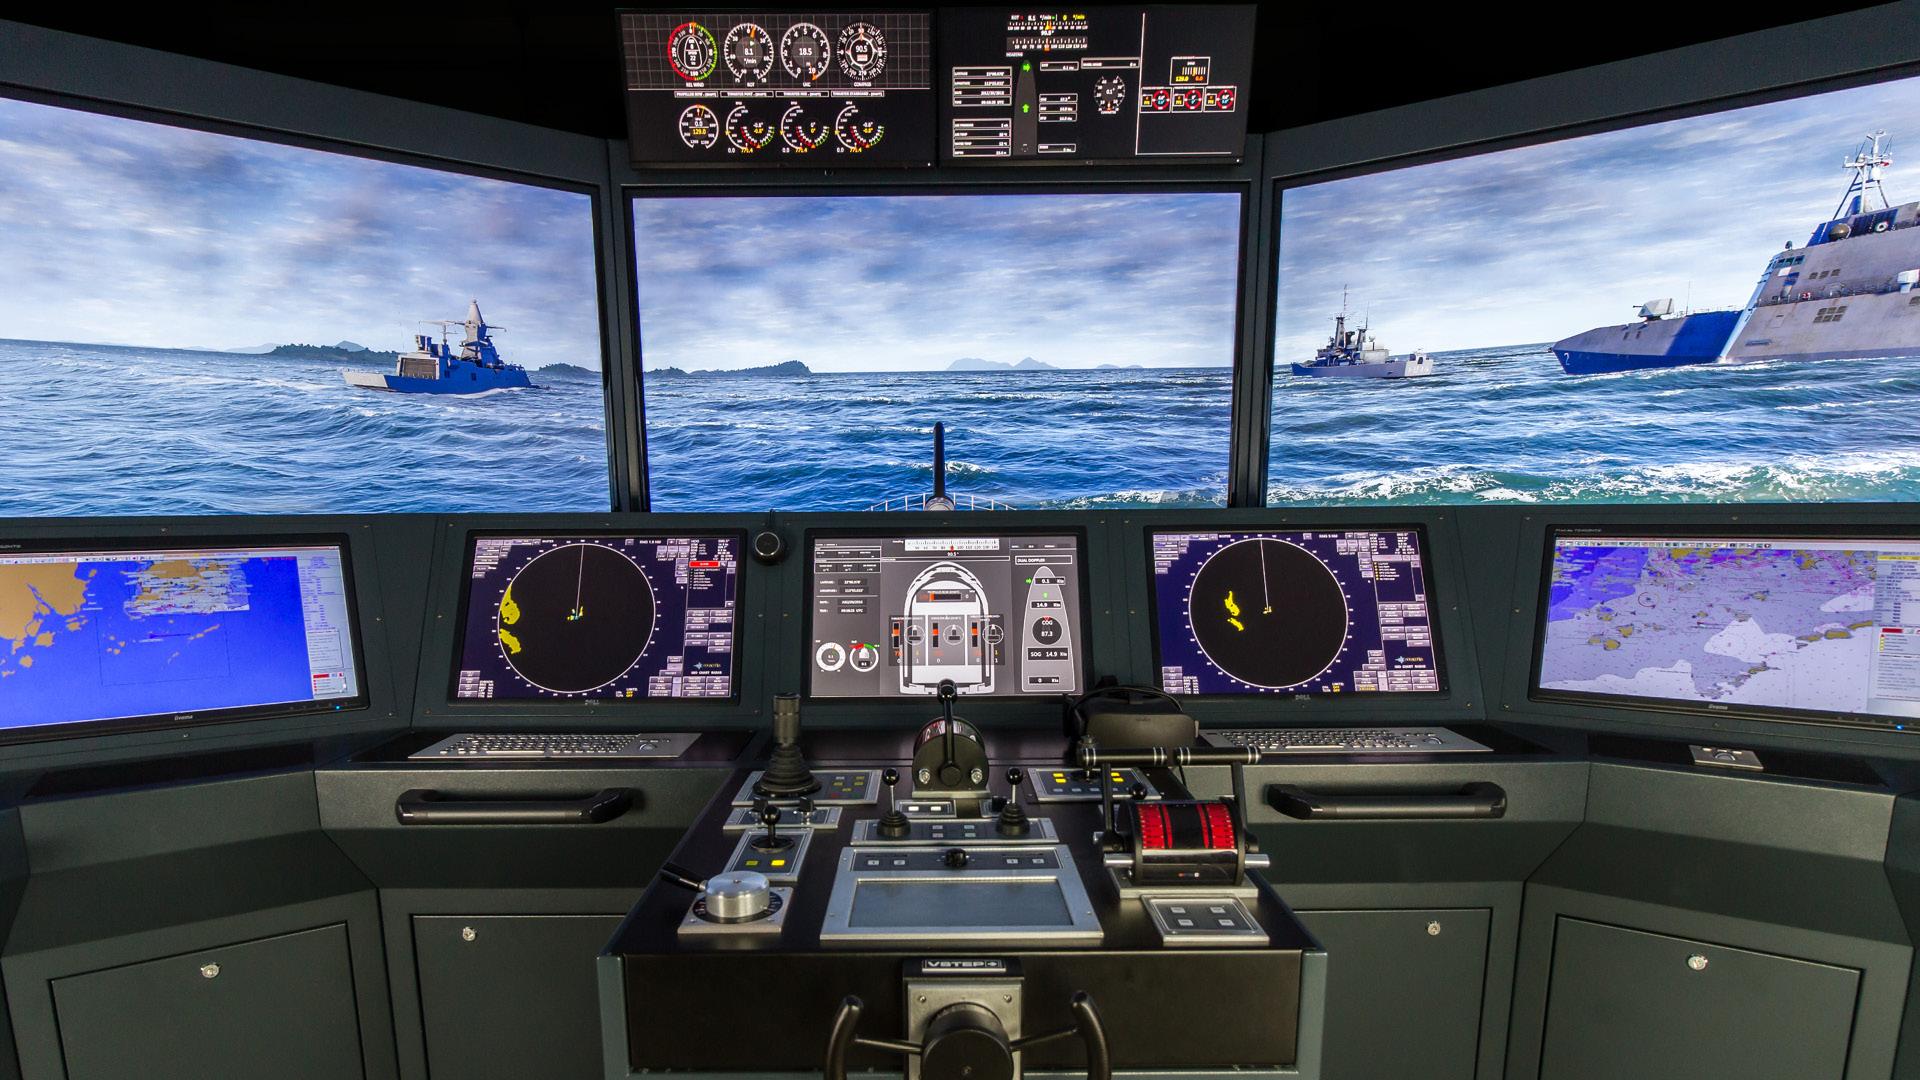 NAUTIS Maritime Simulator - FMBS